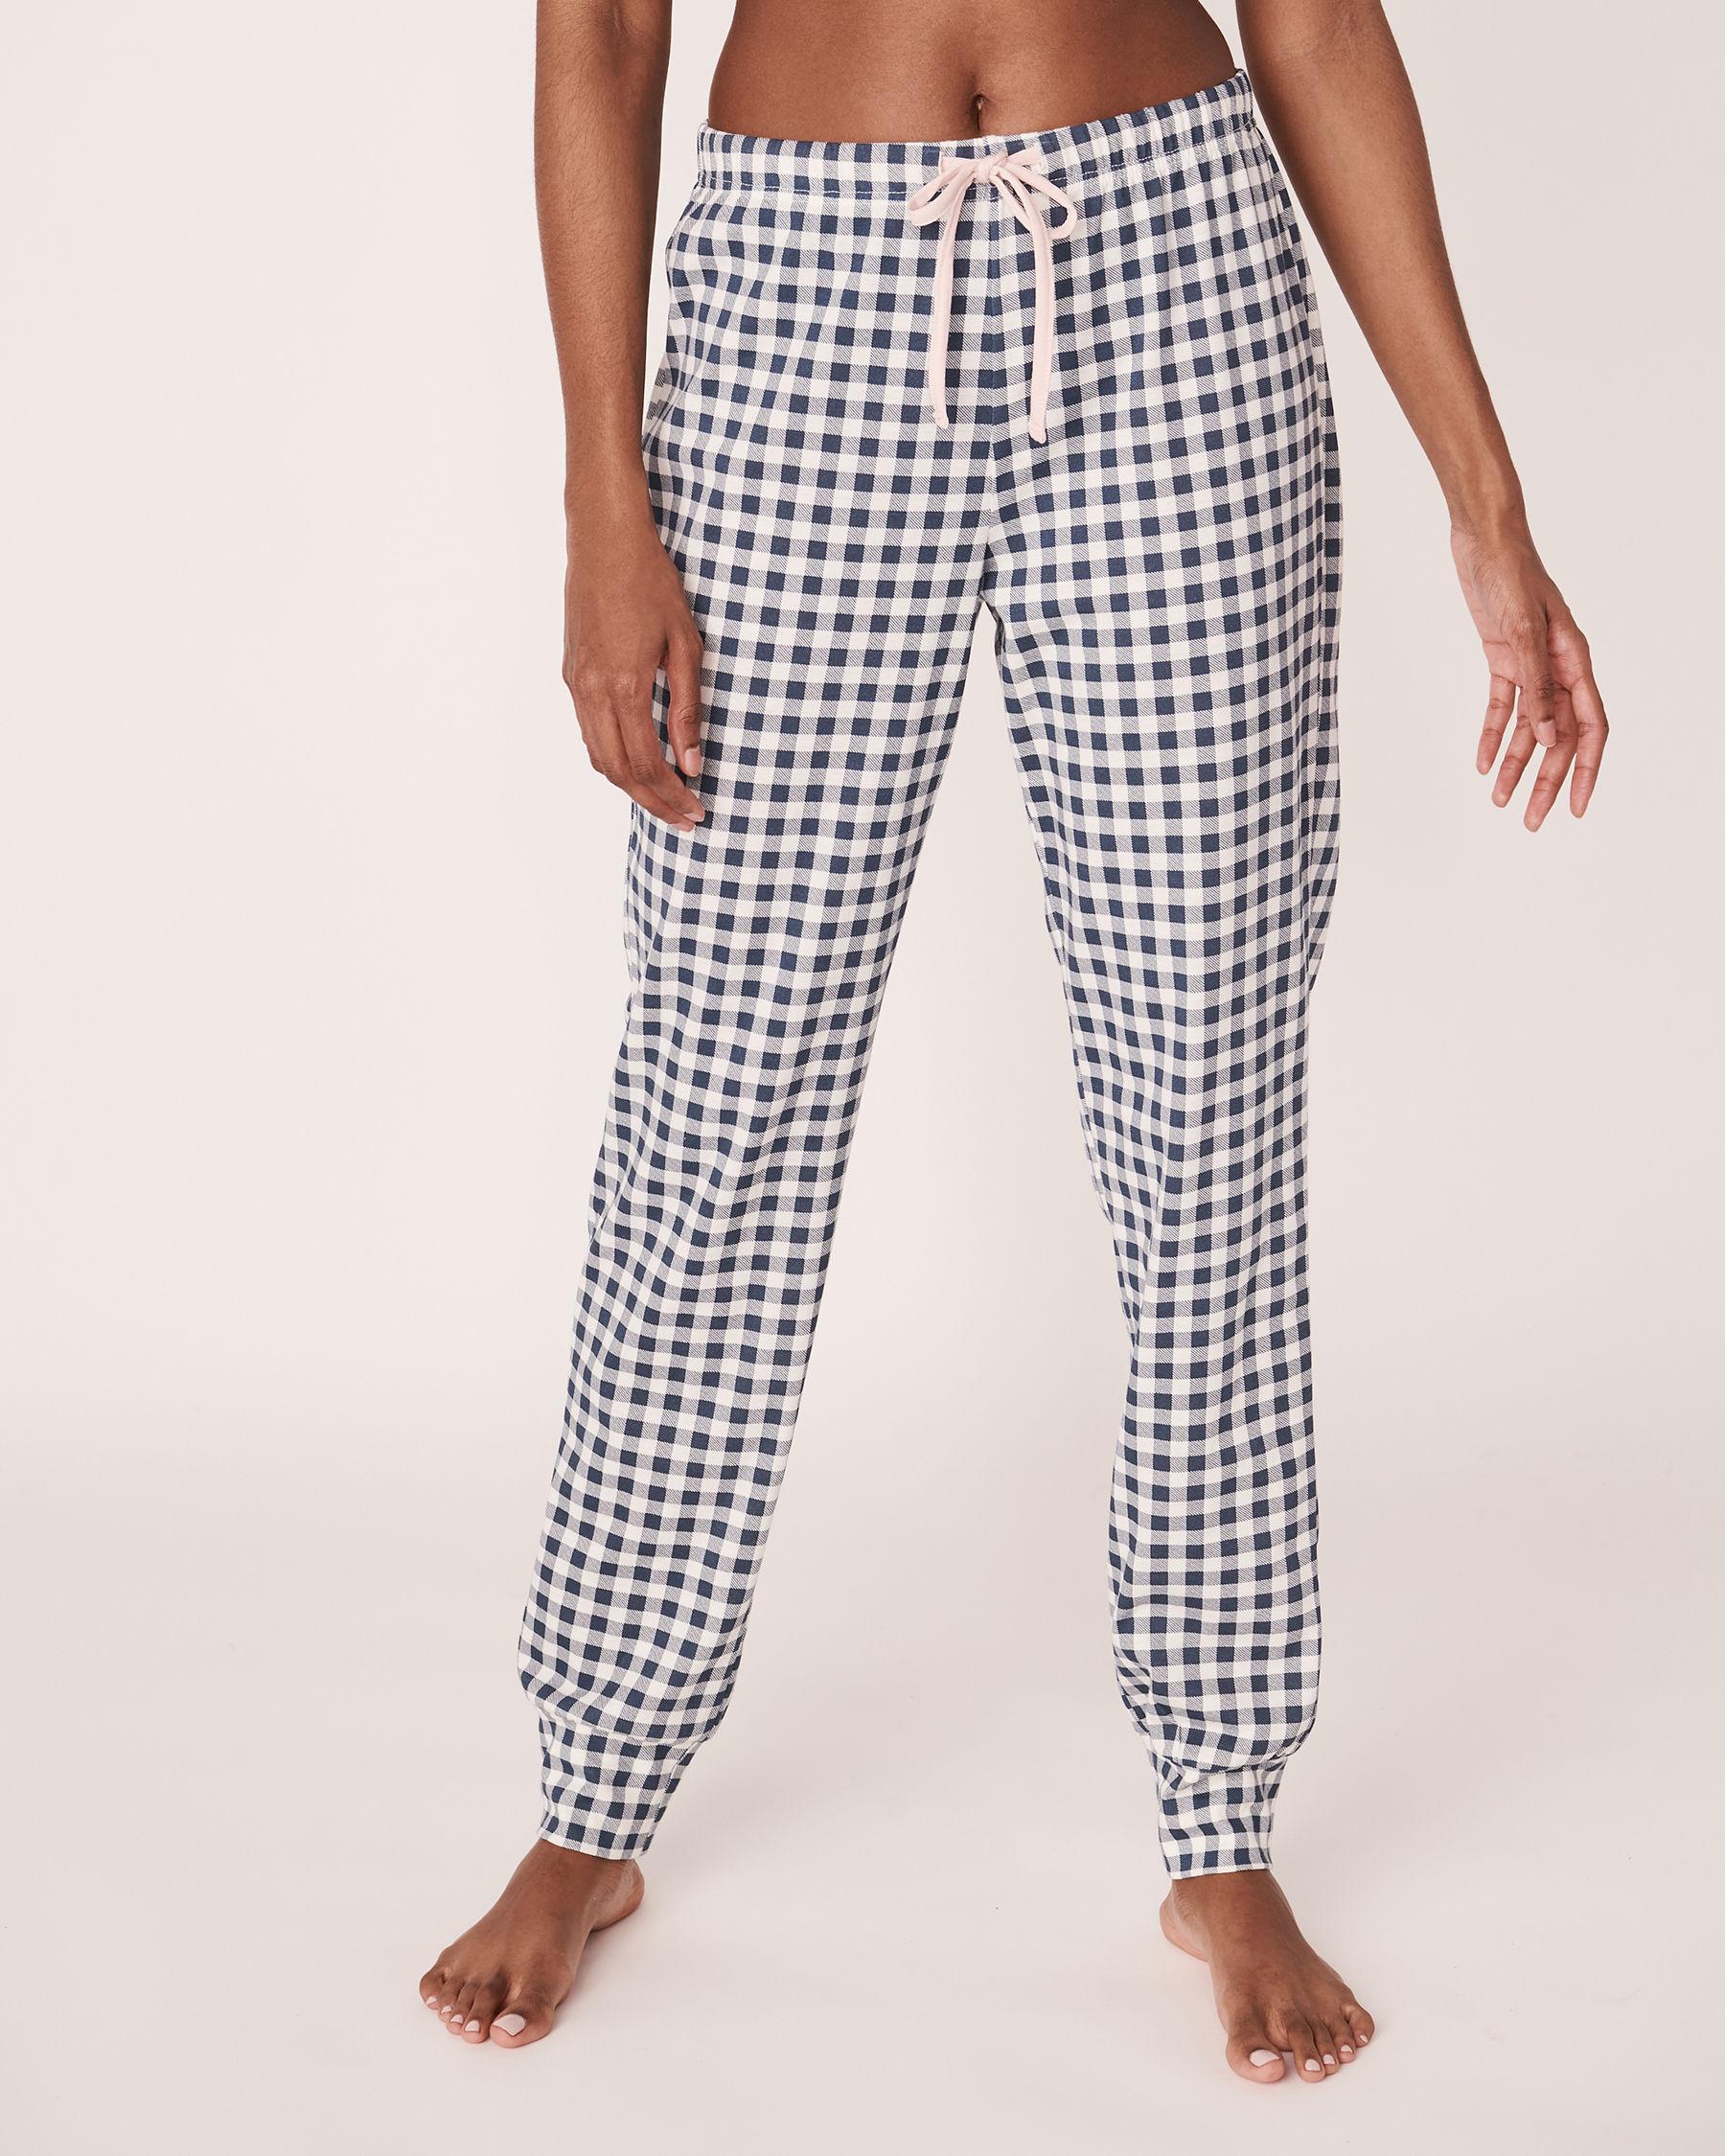 LA VIE EN ROSE Pantalon de pyjama ajusté Vichy marine 40200109 - Voir1